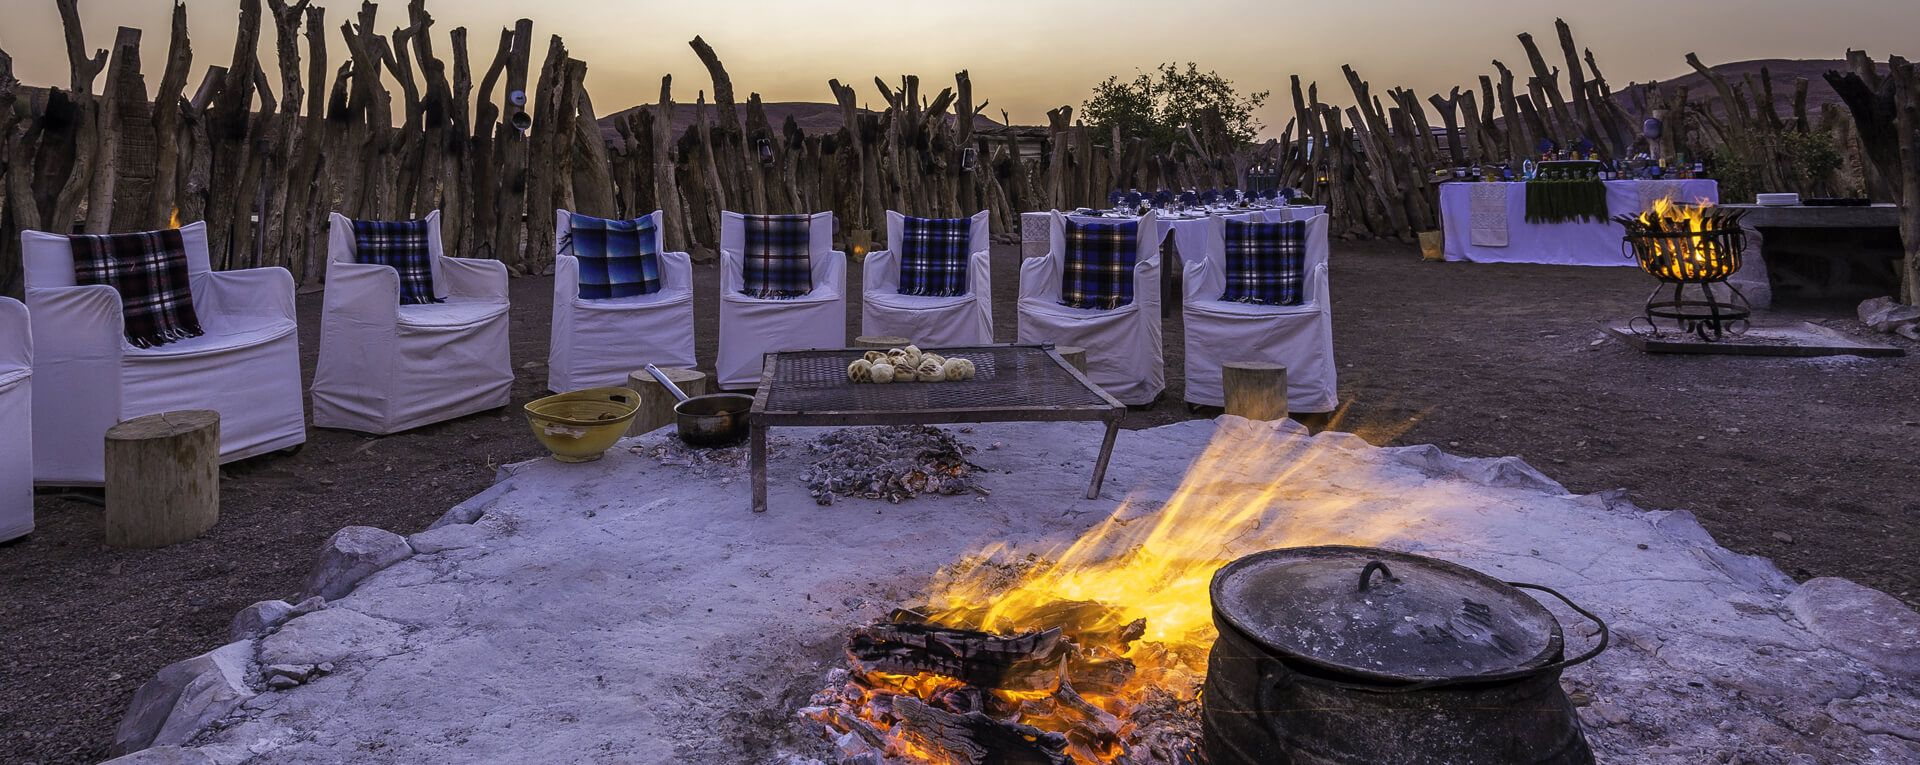 Damaraland Wilderness Camp